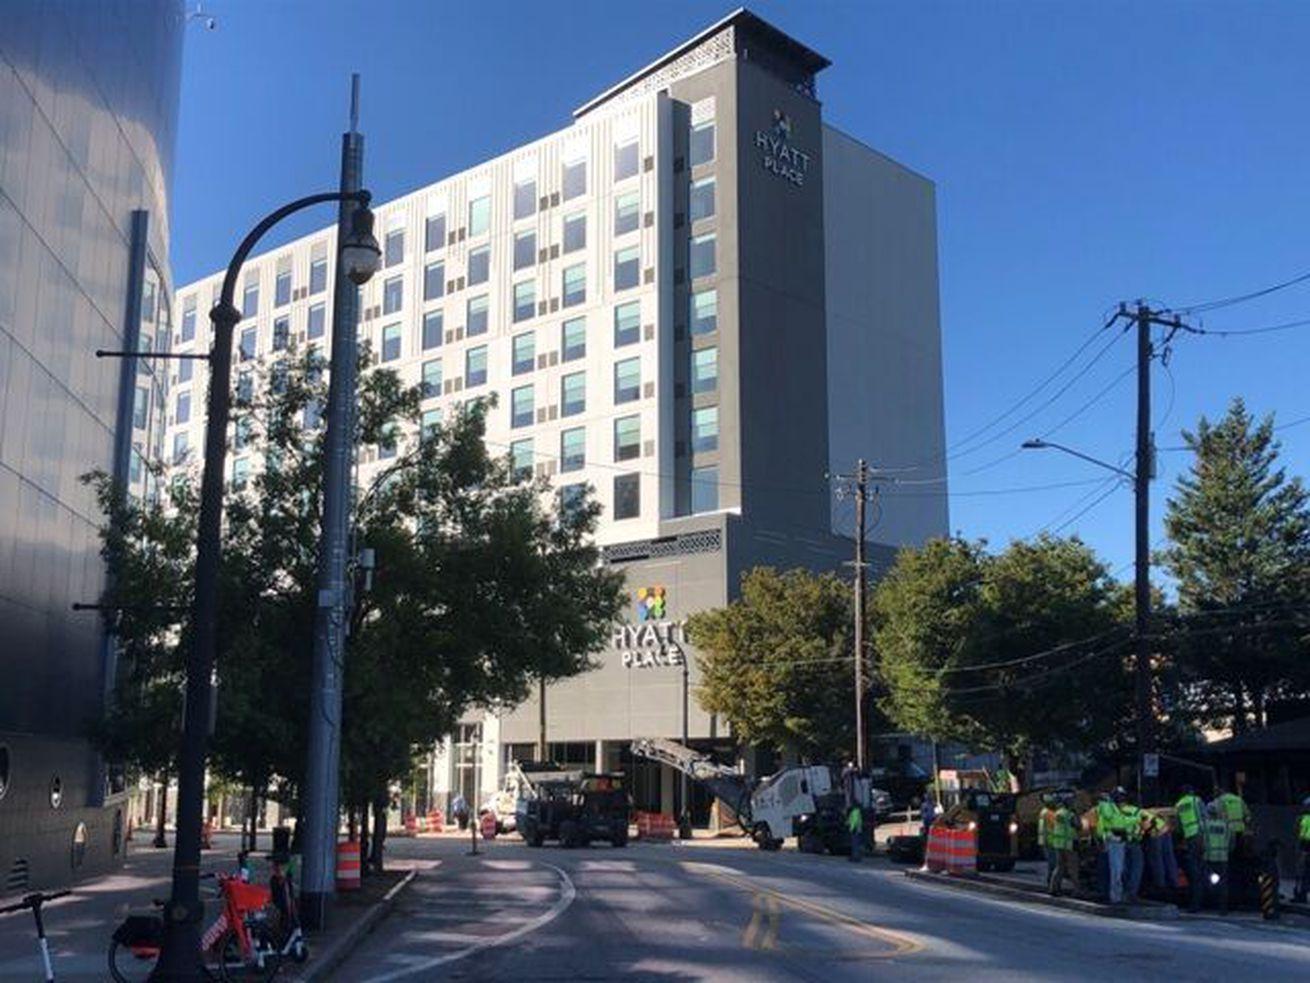 Downtown's latest hotel debuts, overlooking Georgia Aquarium